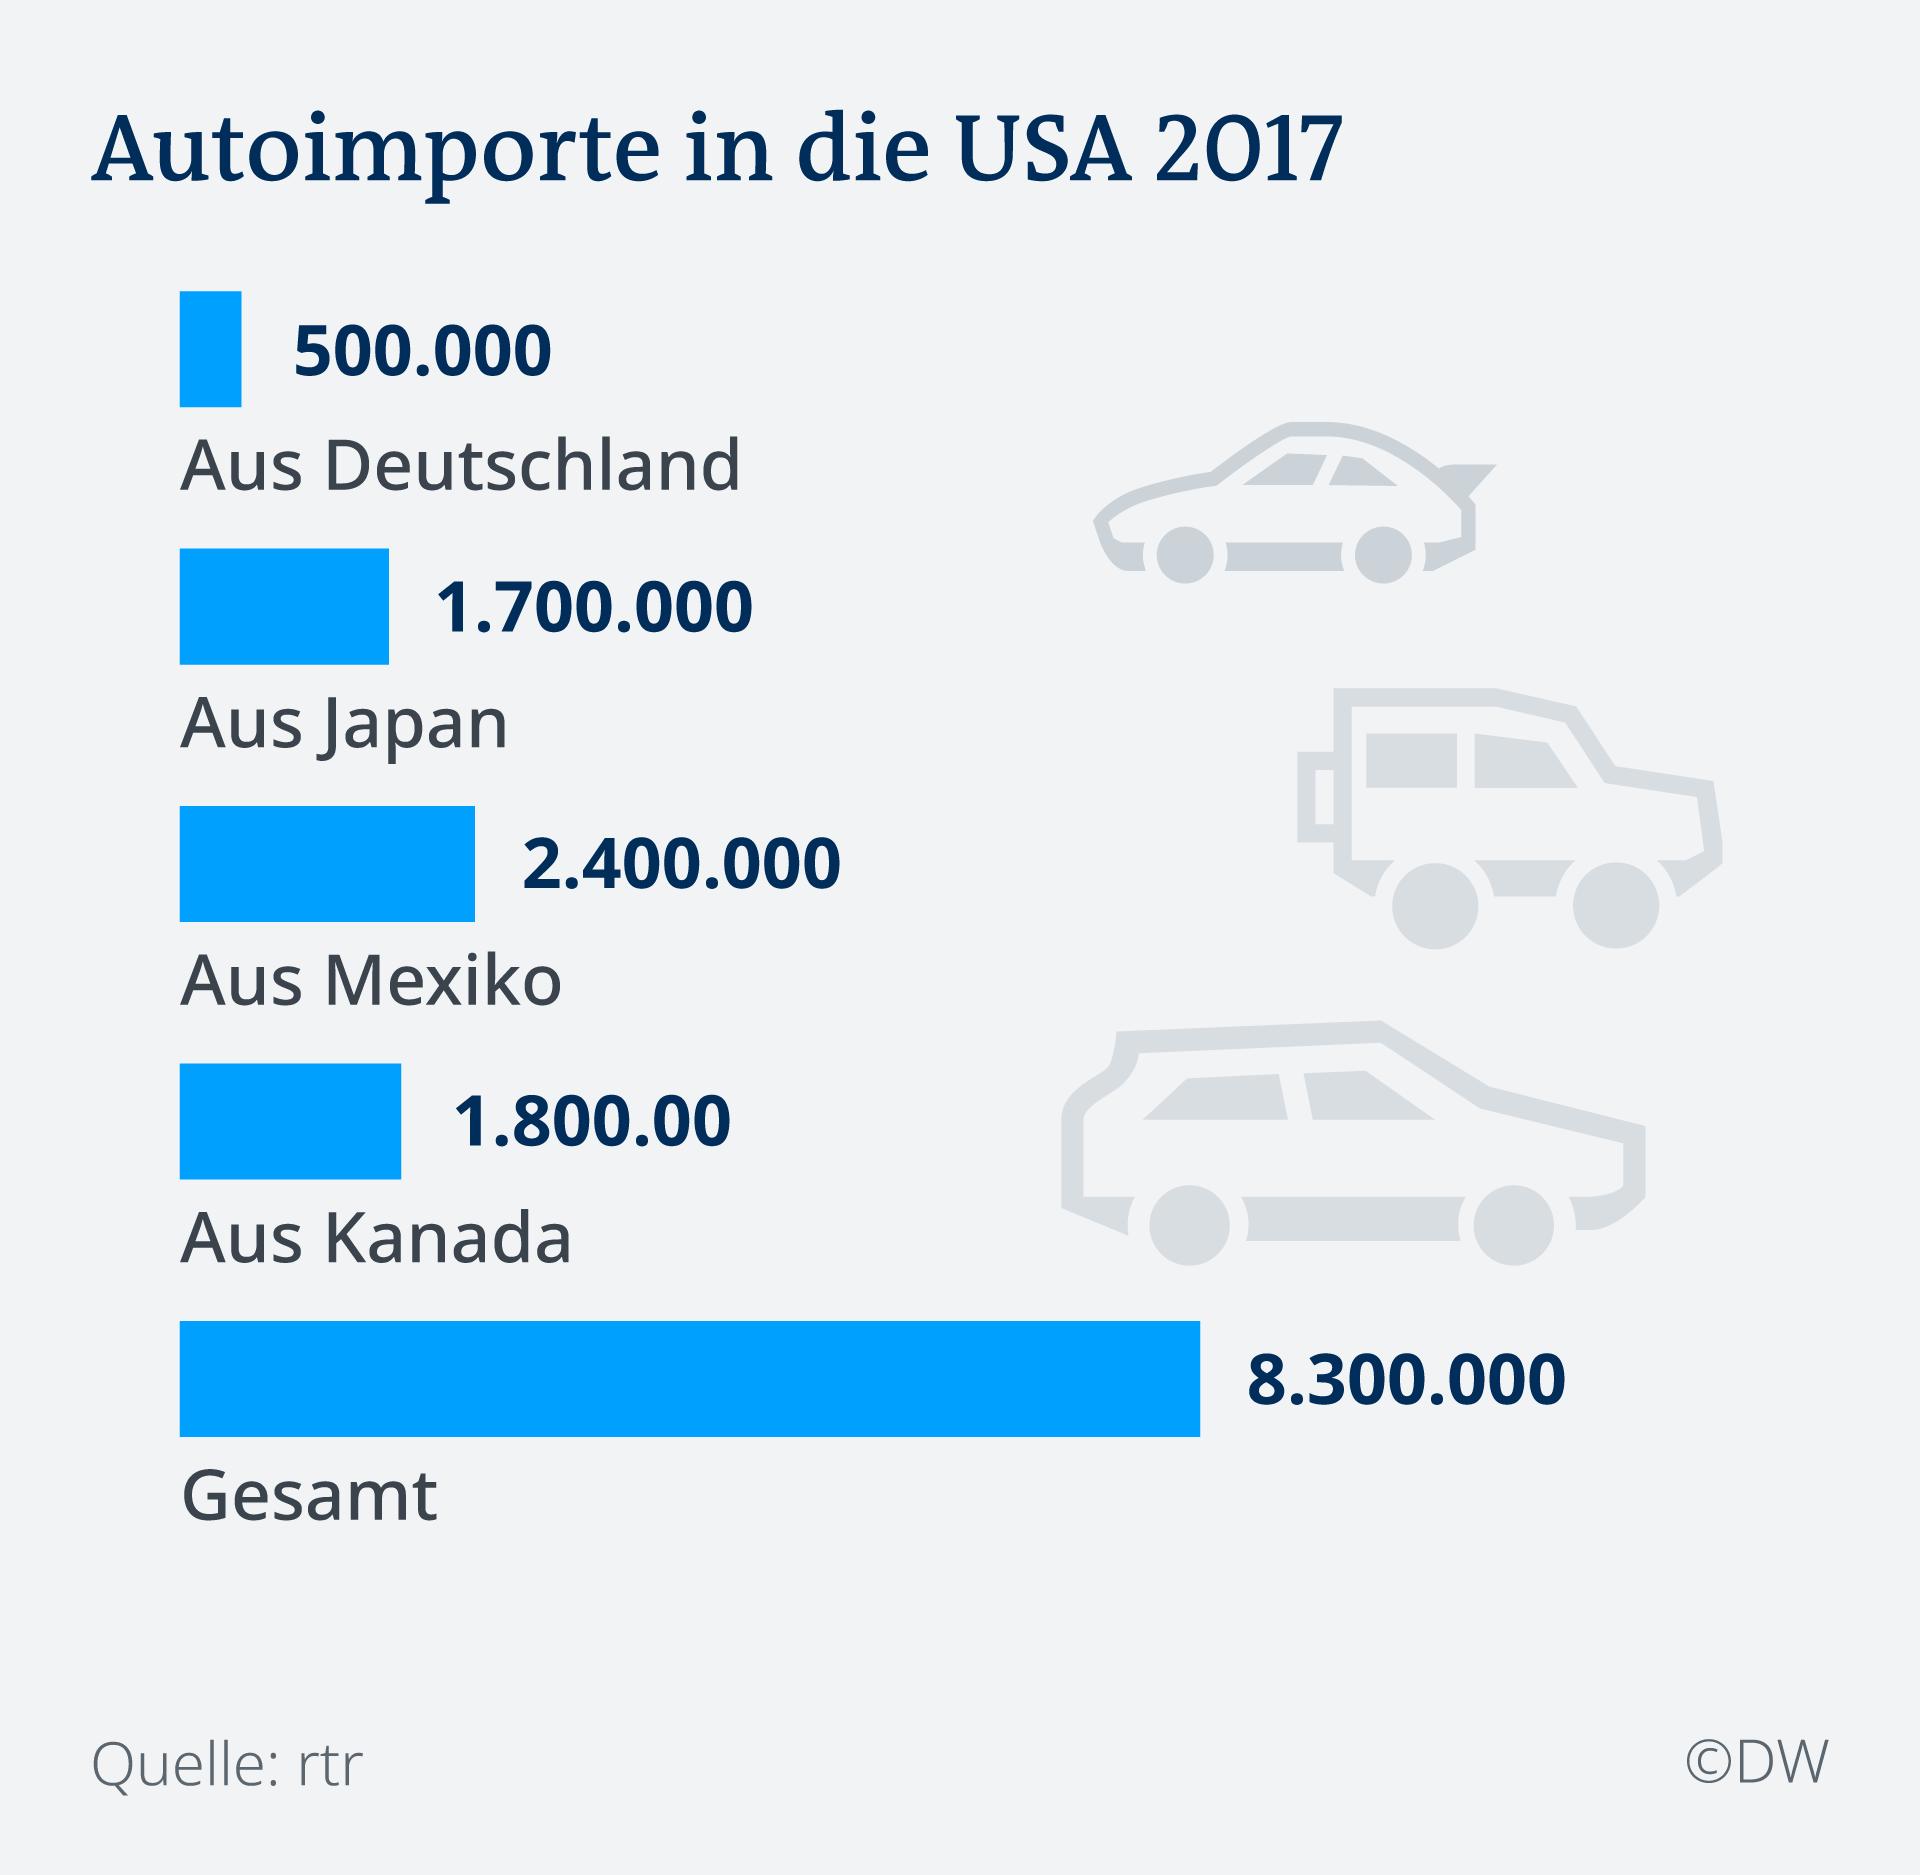 Infografik Autoimporte in die USA 2017 DE